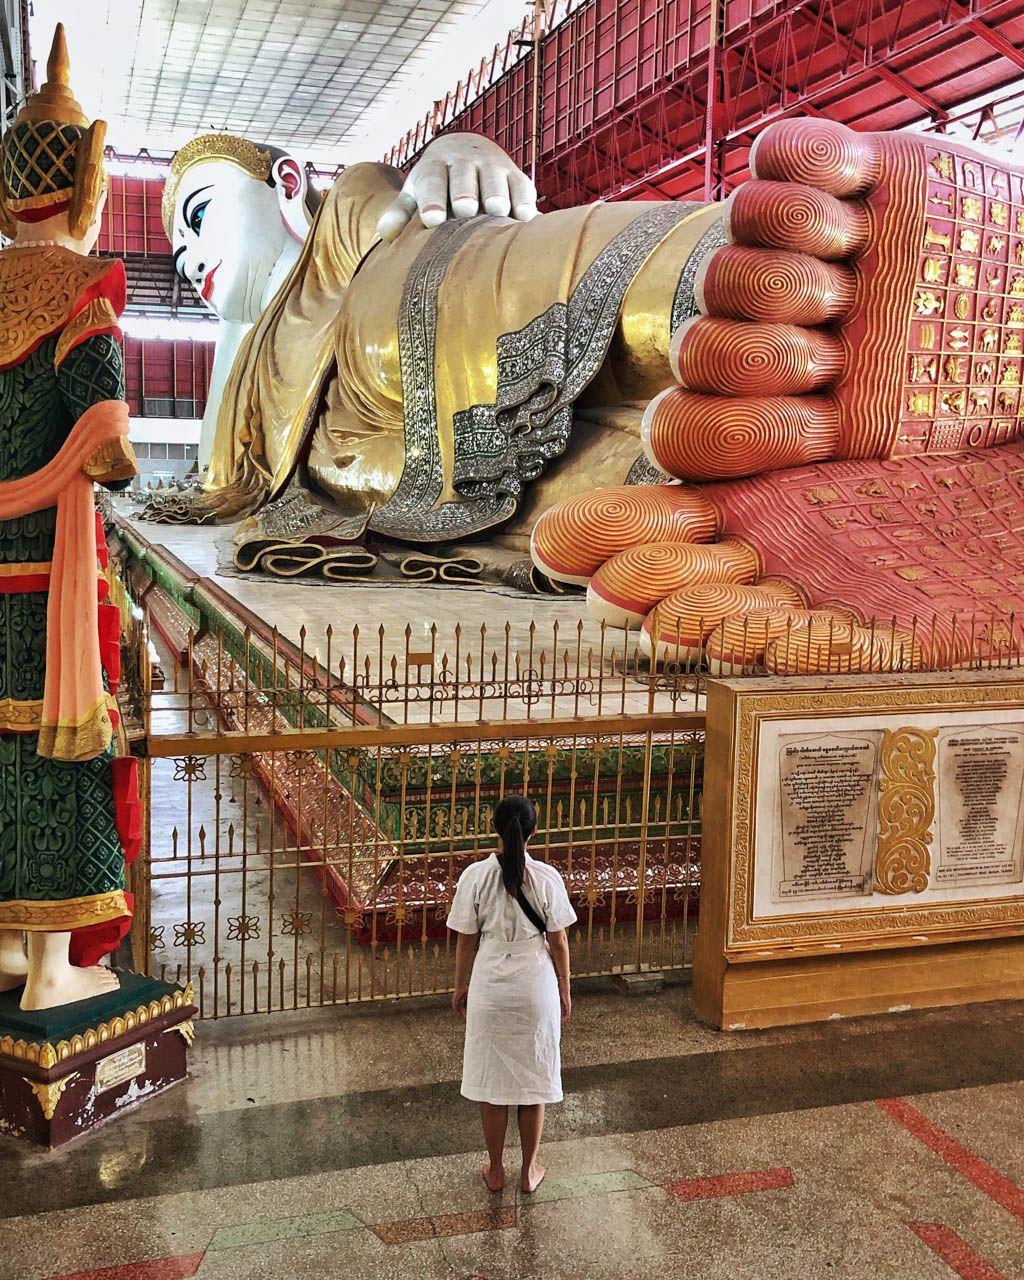 Reclining Buddha in Yangon, Myanmar.